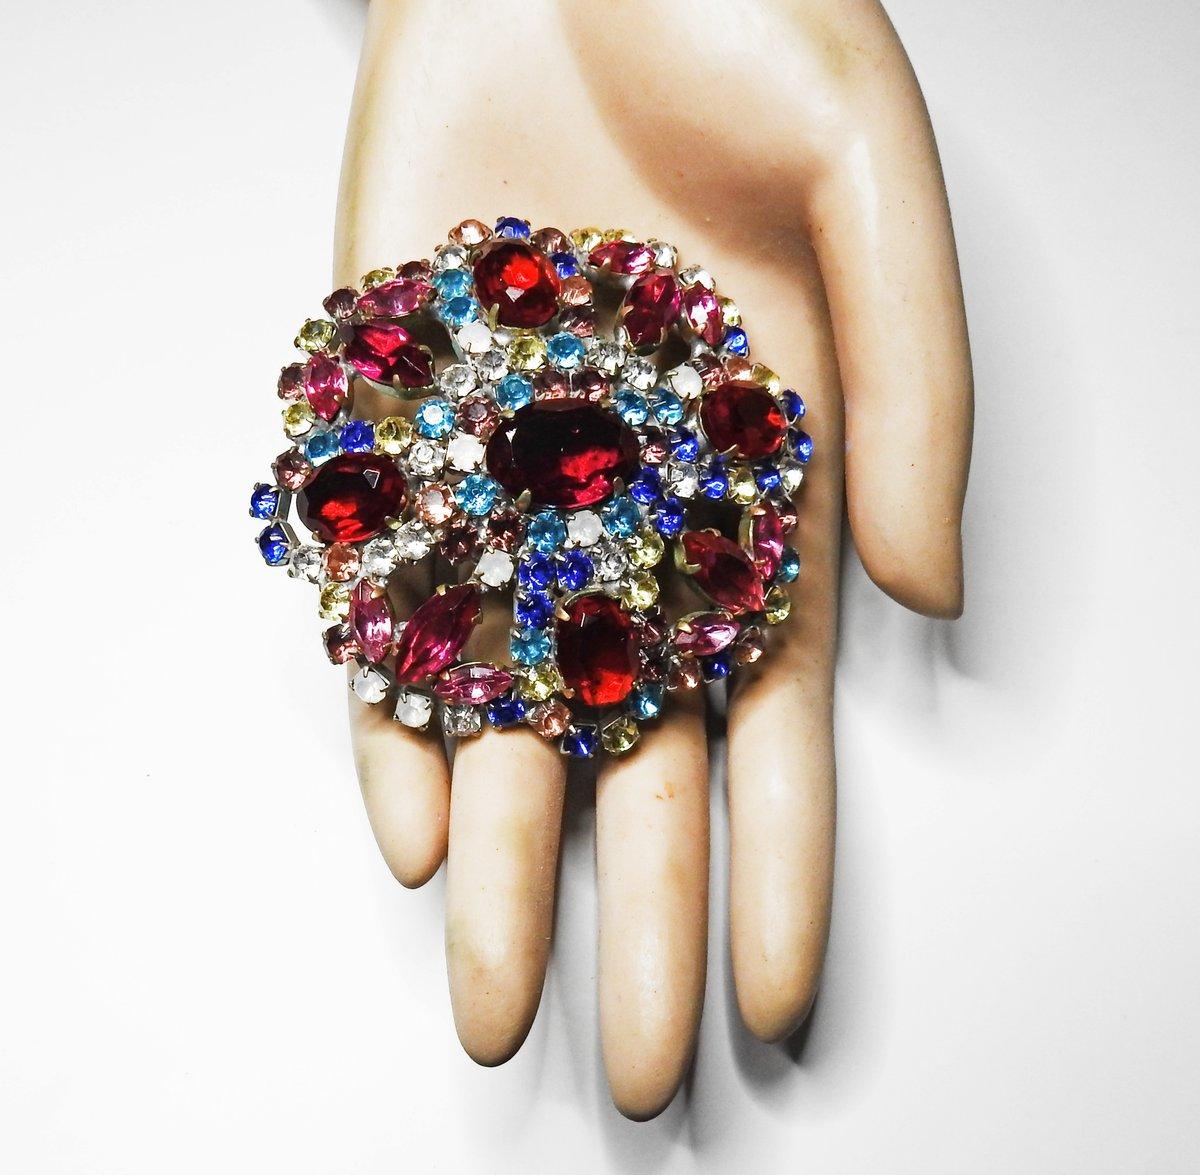 💜   #glassworks #broochaddict #brooche #jewelrygiftsforher #jewelrygifts #jewelryblogger #jewelryinspiration #jewelrystyle #jewelrystore #jewelryshop #oneofakindjewelry #jewelrylovers #luxurylifestyle #jewels #giftidea #perfectgift